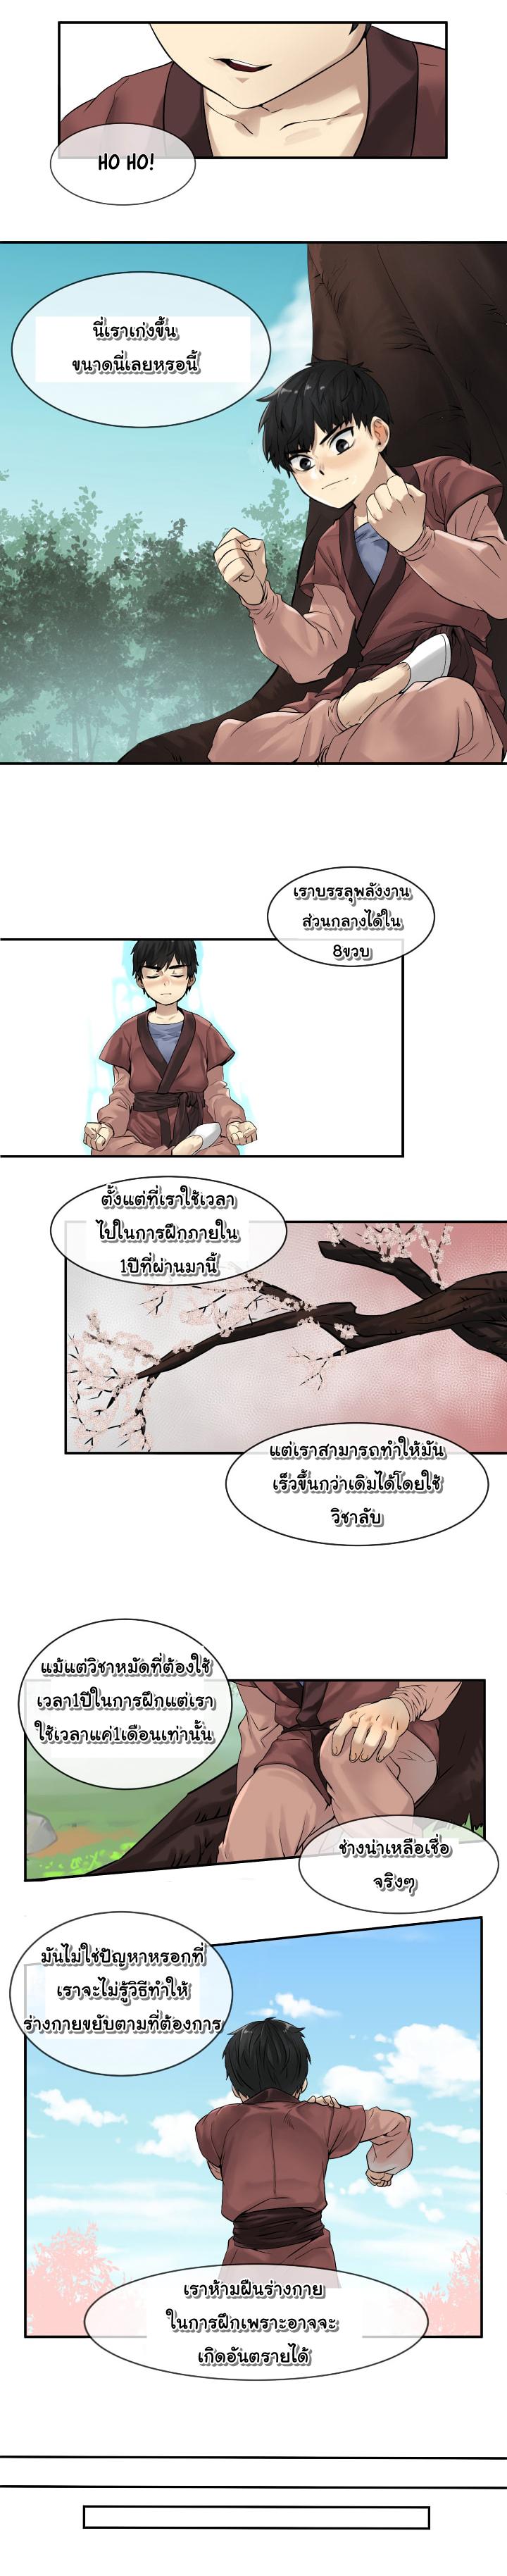 Volcanic Age - หน้า 2